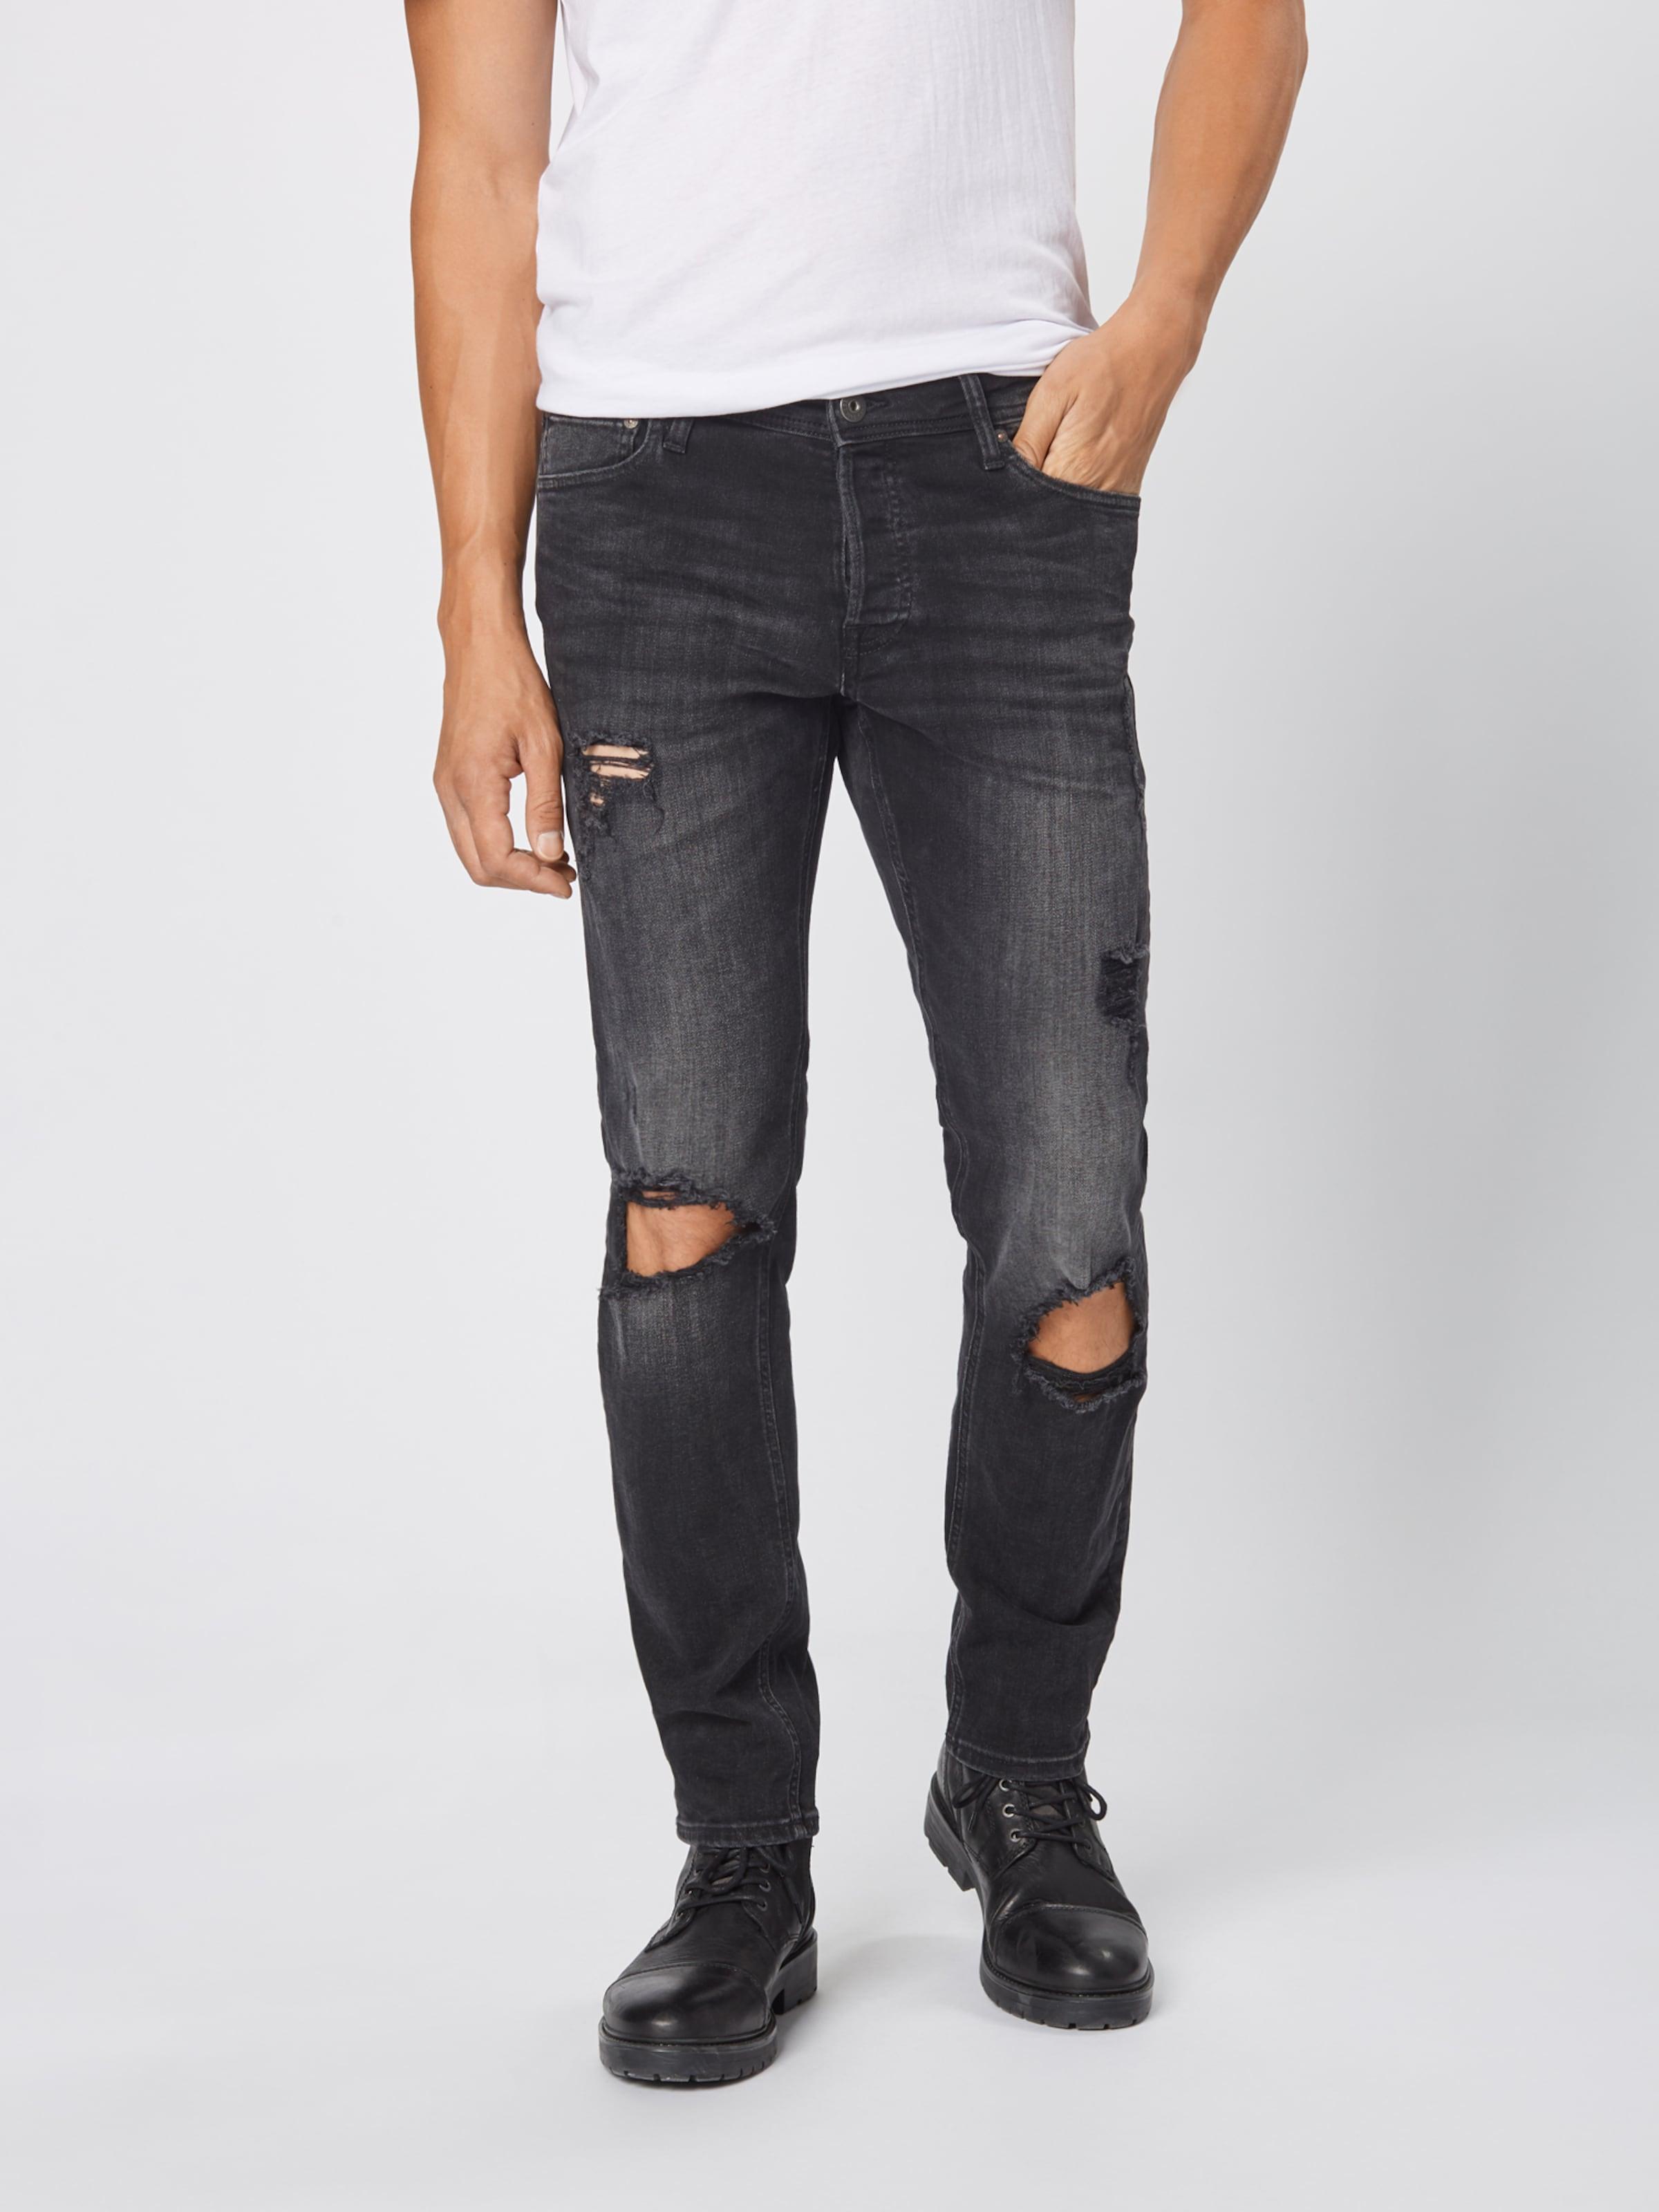 Am Jjoriginal 847' Black In Jones 'jjiglenn Denim Jackamp; Jeans 0knXOwPN8